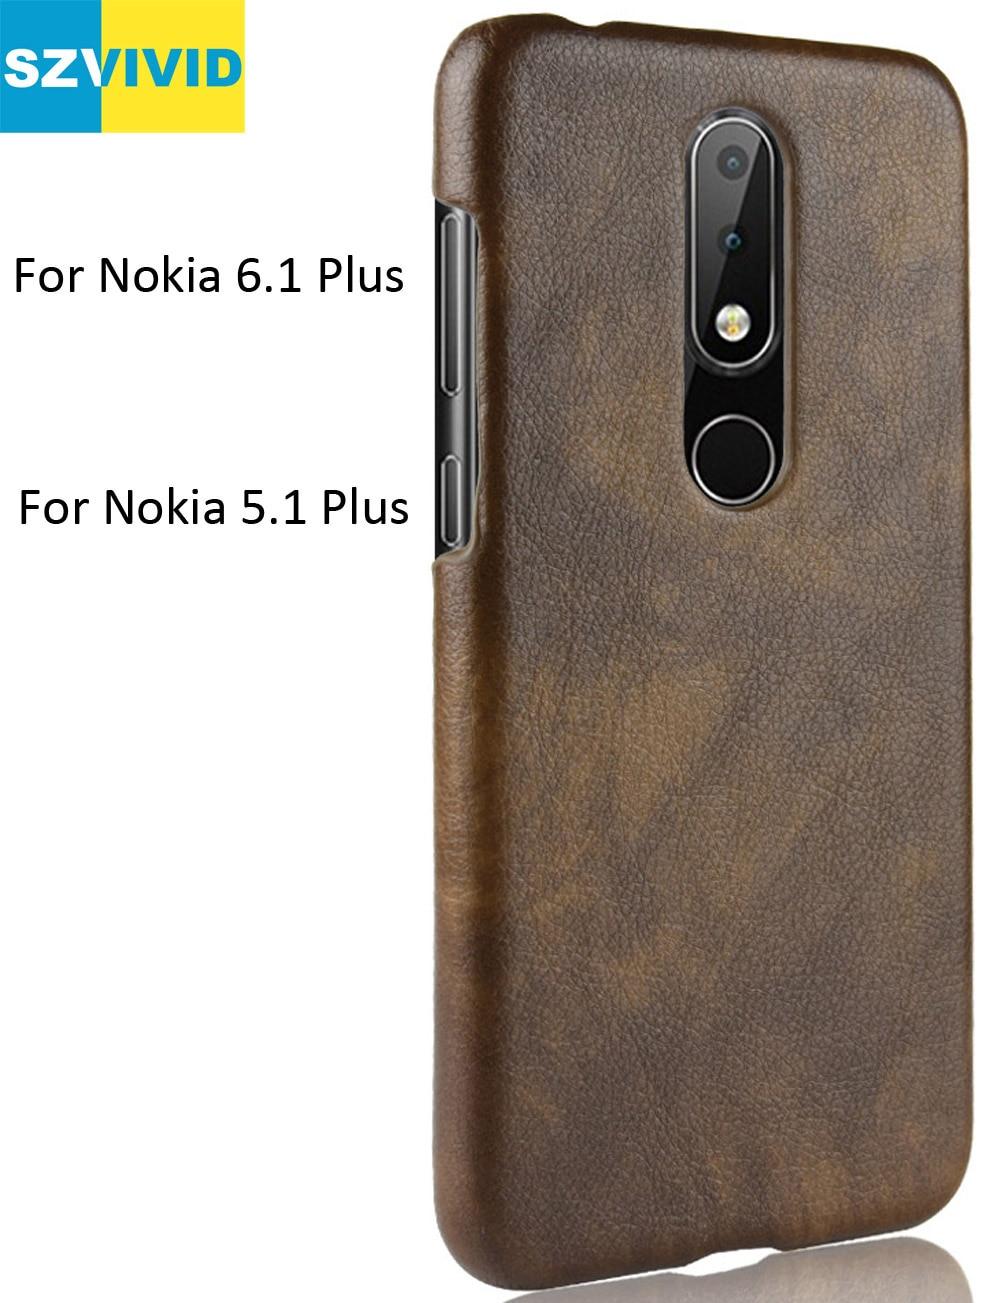 Retro Vintage Cover Case For Nokia 6.1 Plus PU Leather